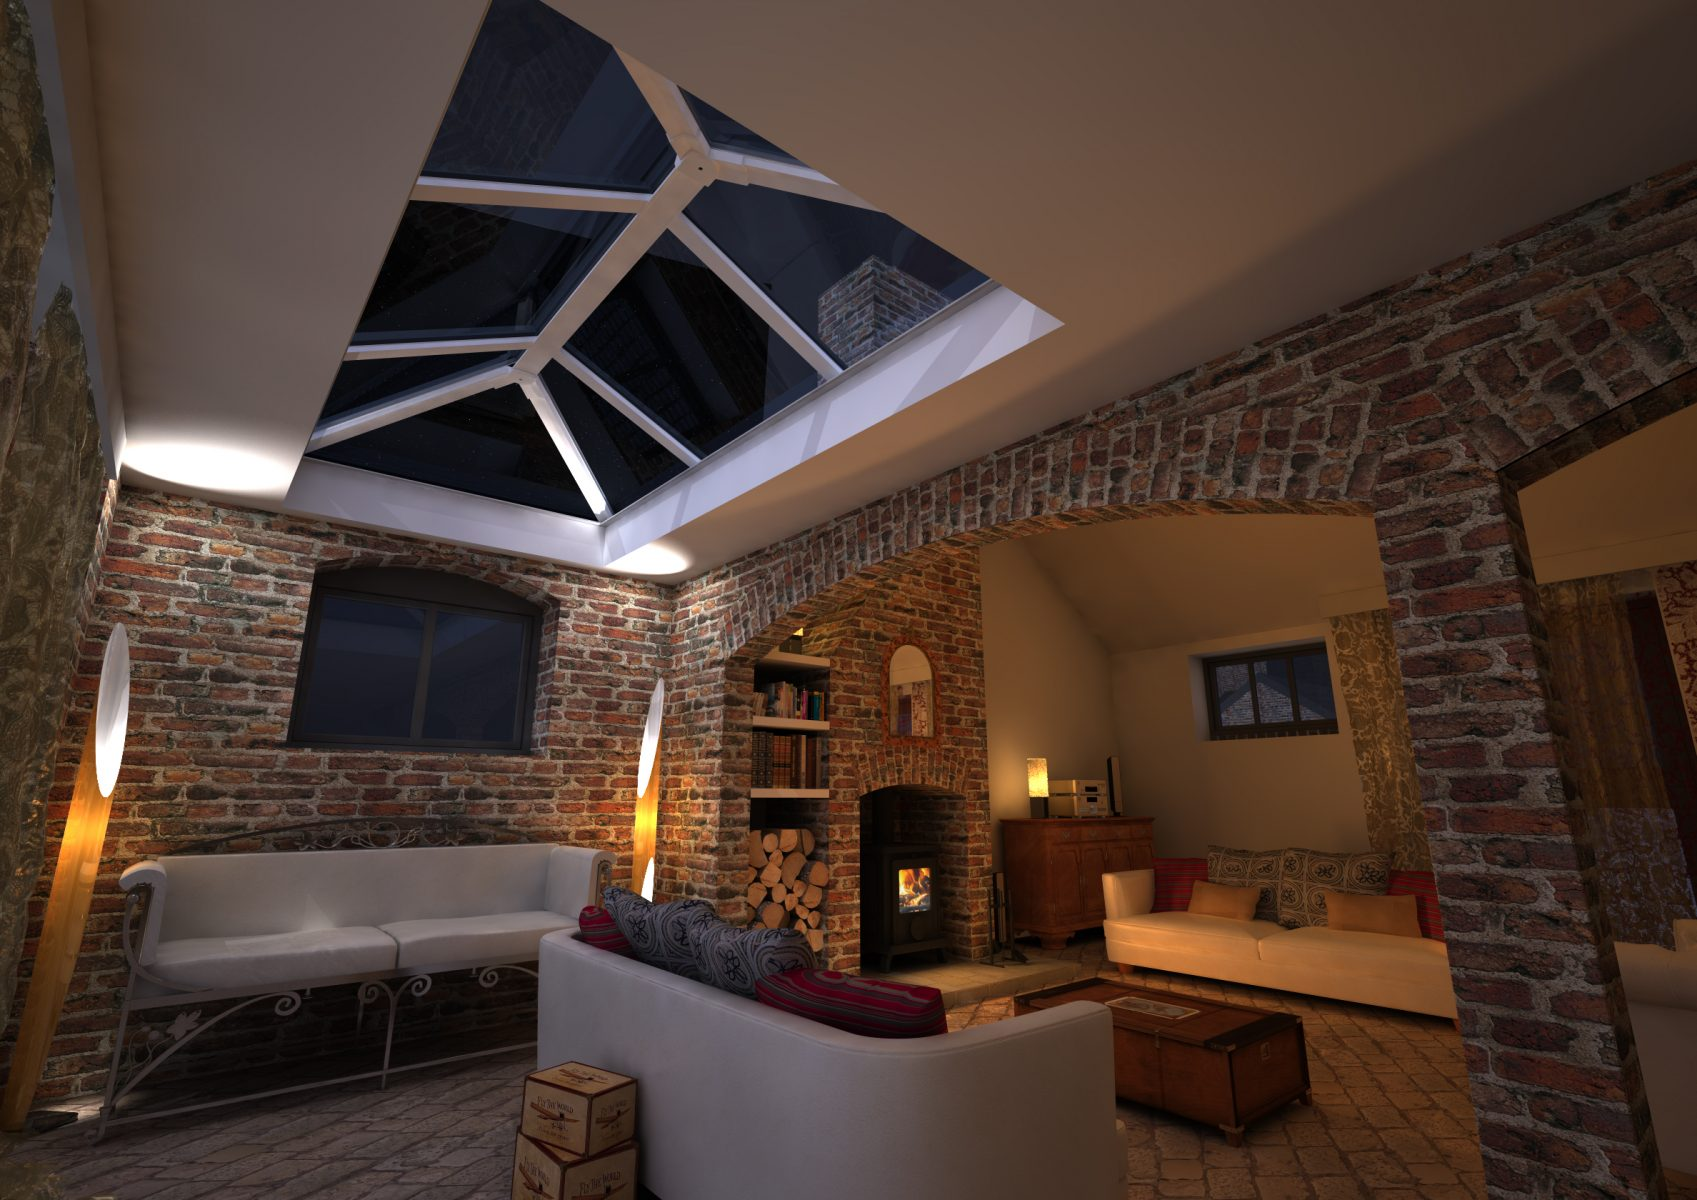 Skypod Skylights - Interior